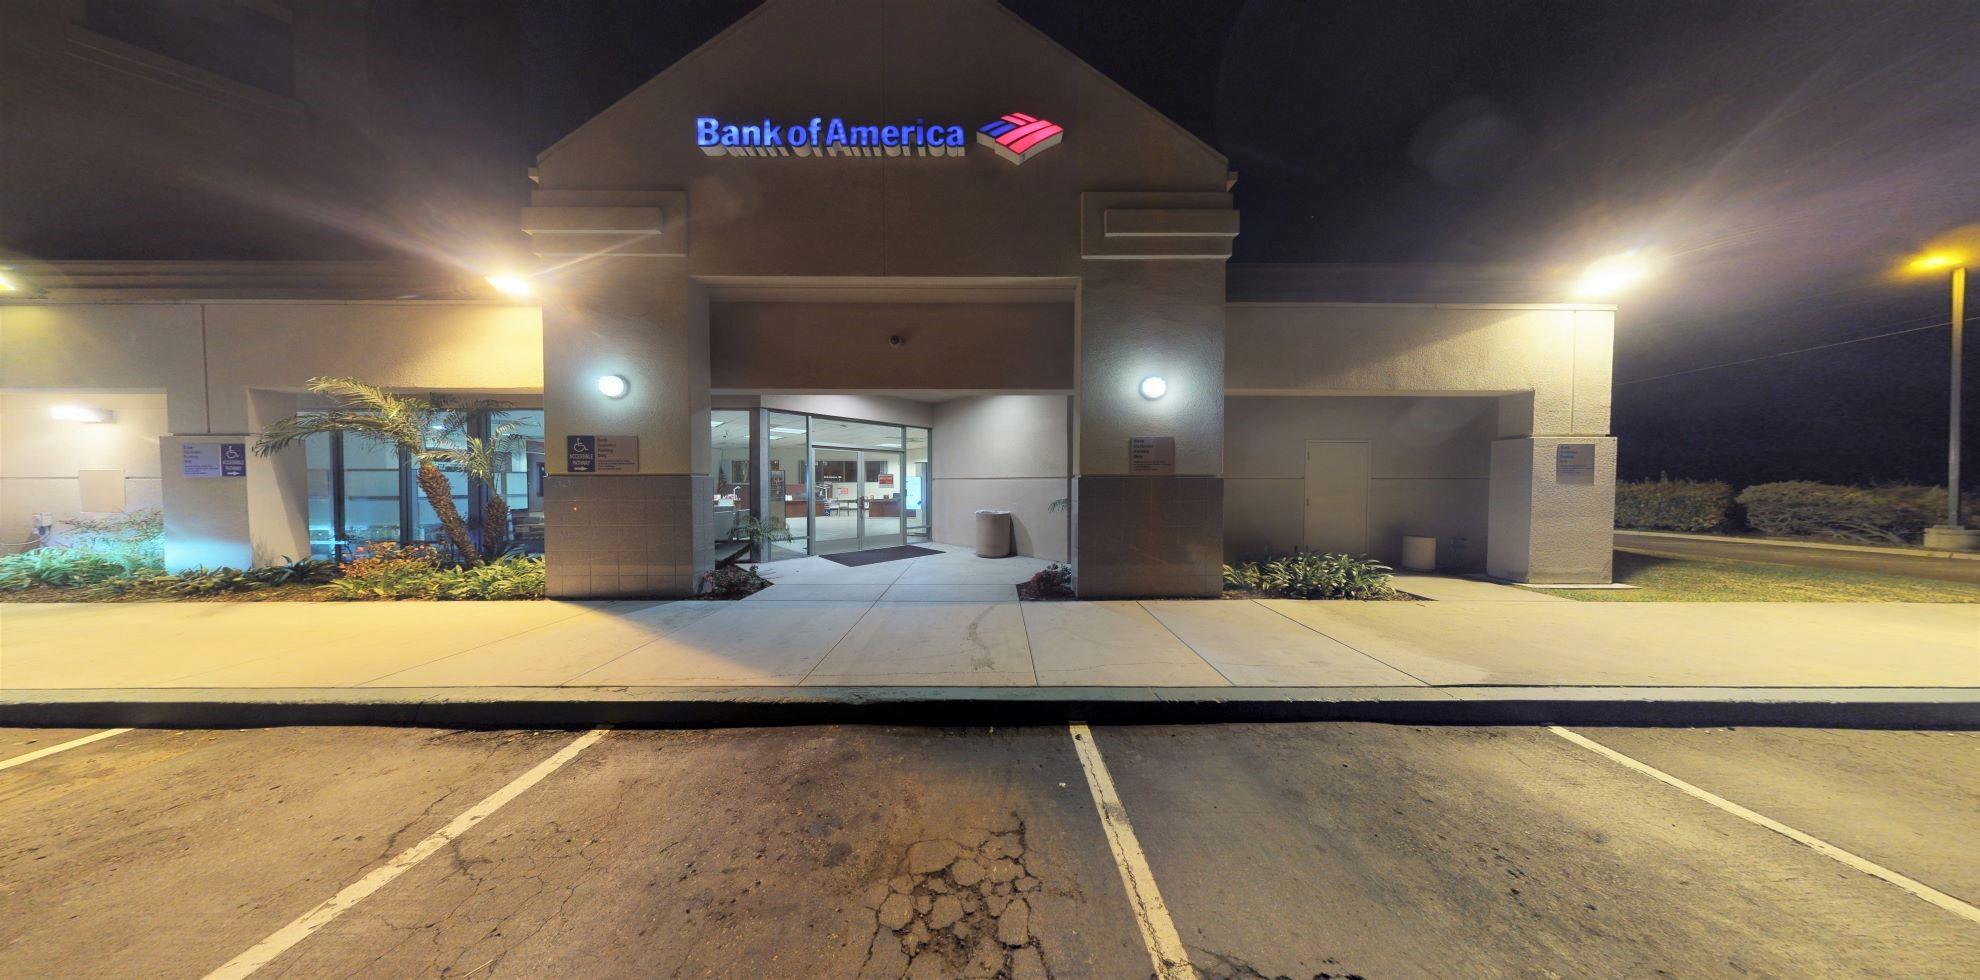 Bank of America financial center with drive-thru ATM   9460 Scranton Rd, San Diego, CA 92121